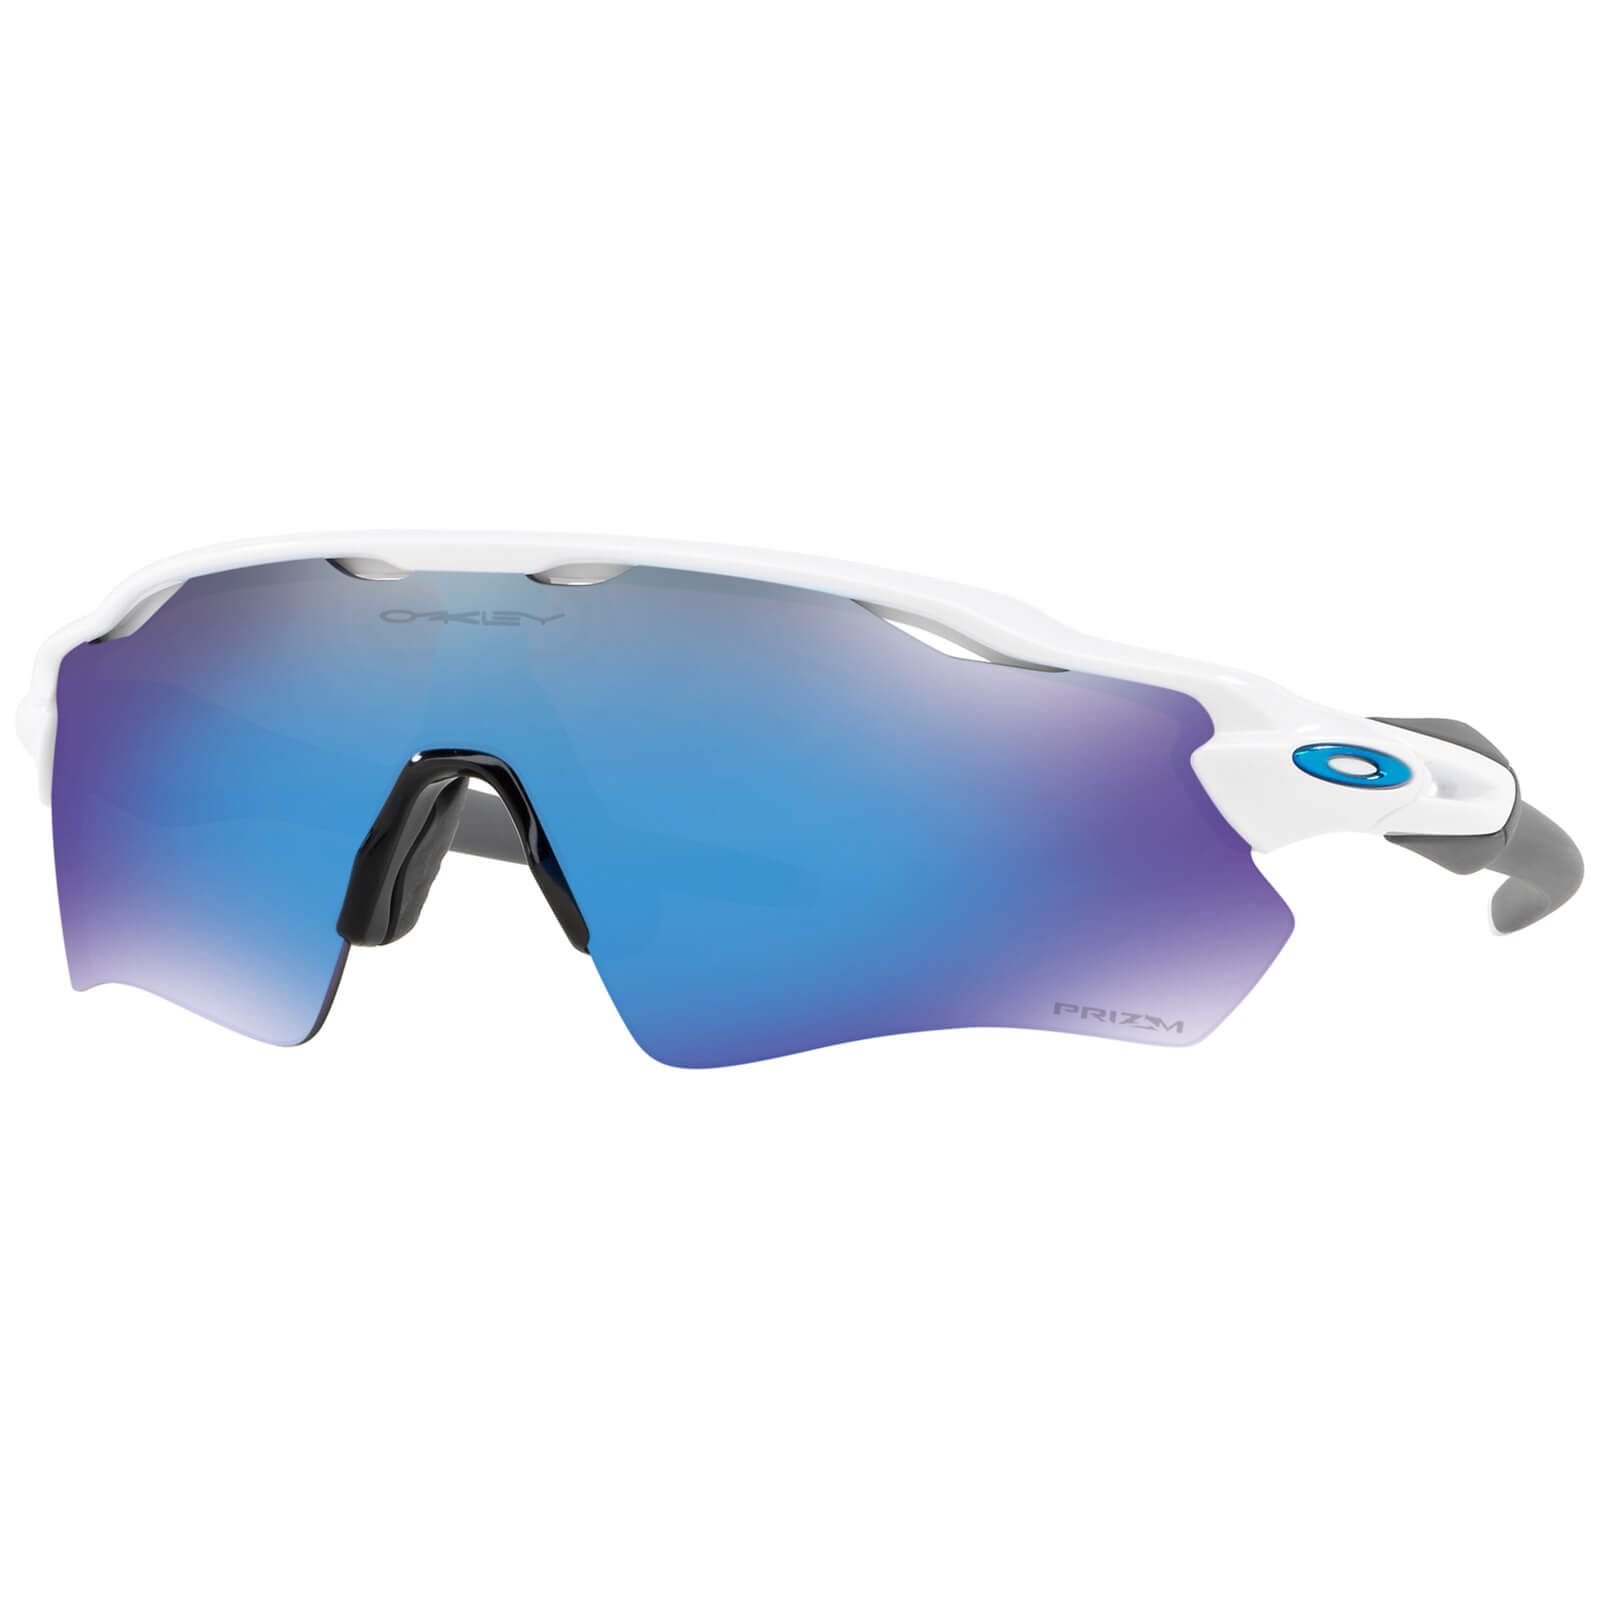 6feda44dc Oakley Radar EV Path Sunglasses - Polished White/Grey/Prizm Sapphire